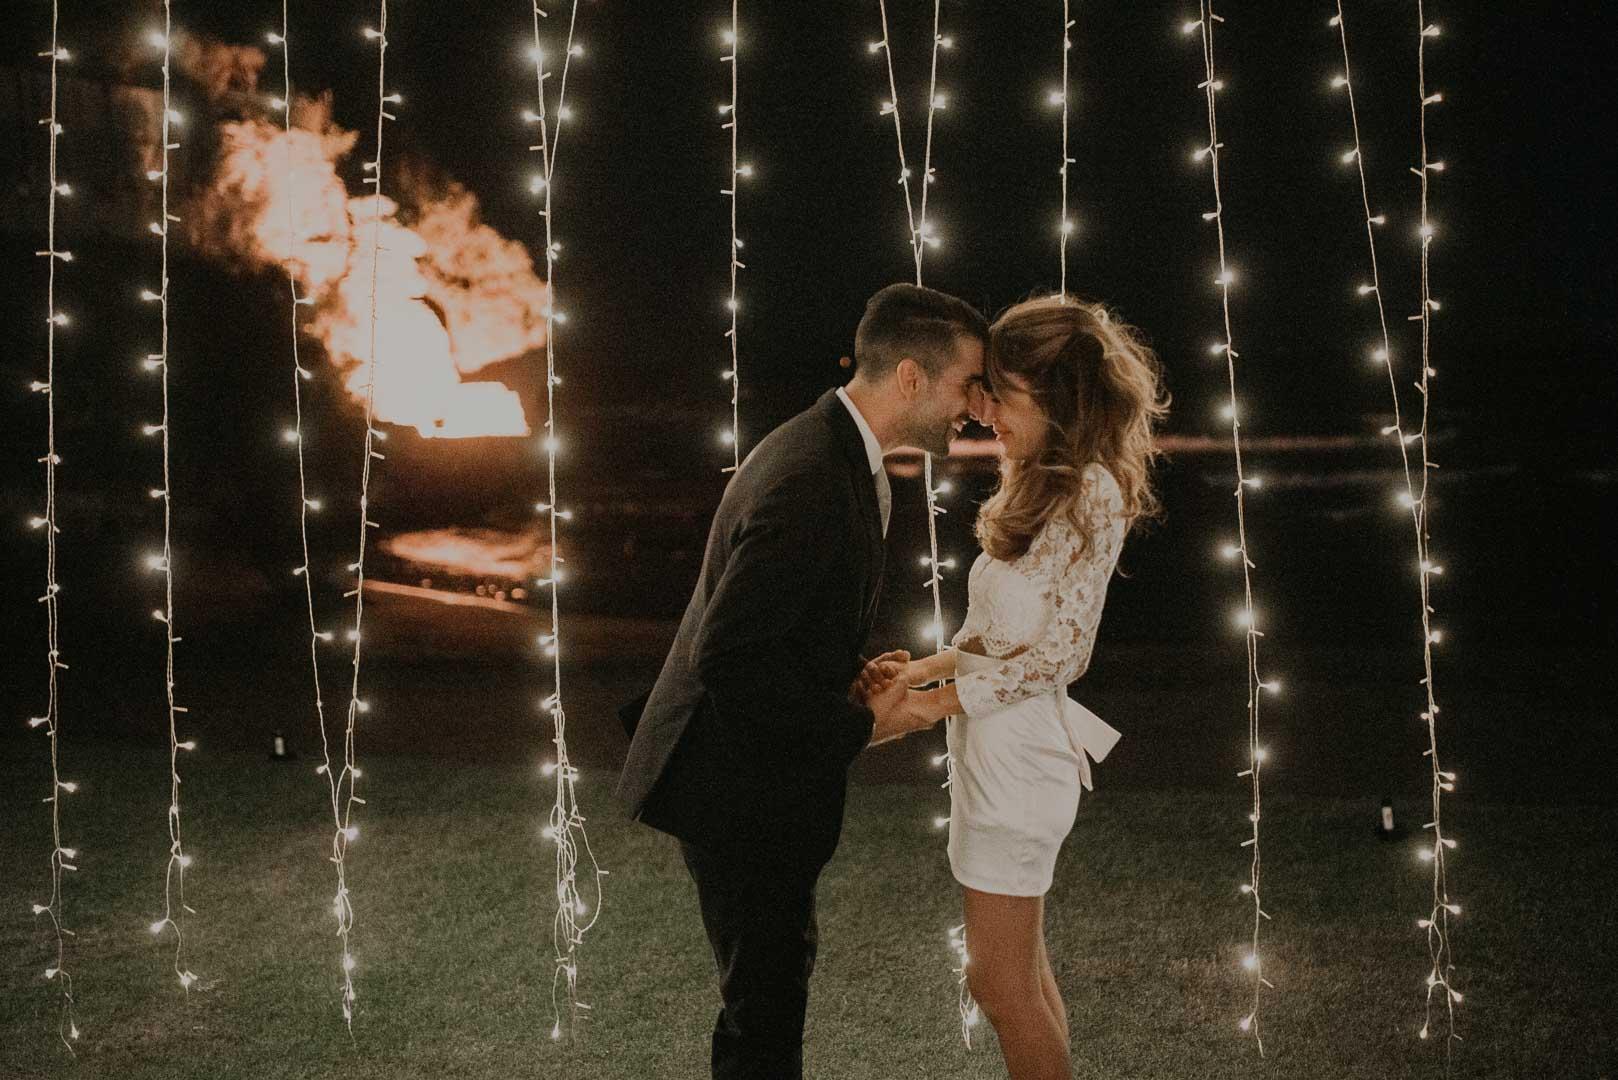 wedding-photographer-destination-fineart-bespoke-reportage-napoli-nabilah-vivianeizzo-spazio46-186